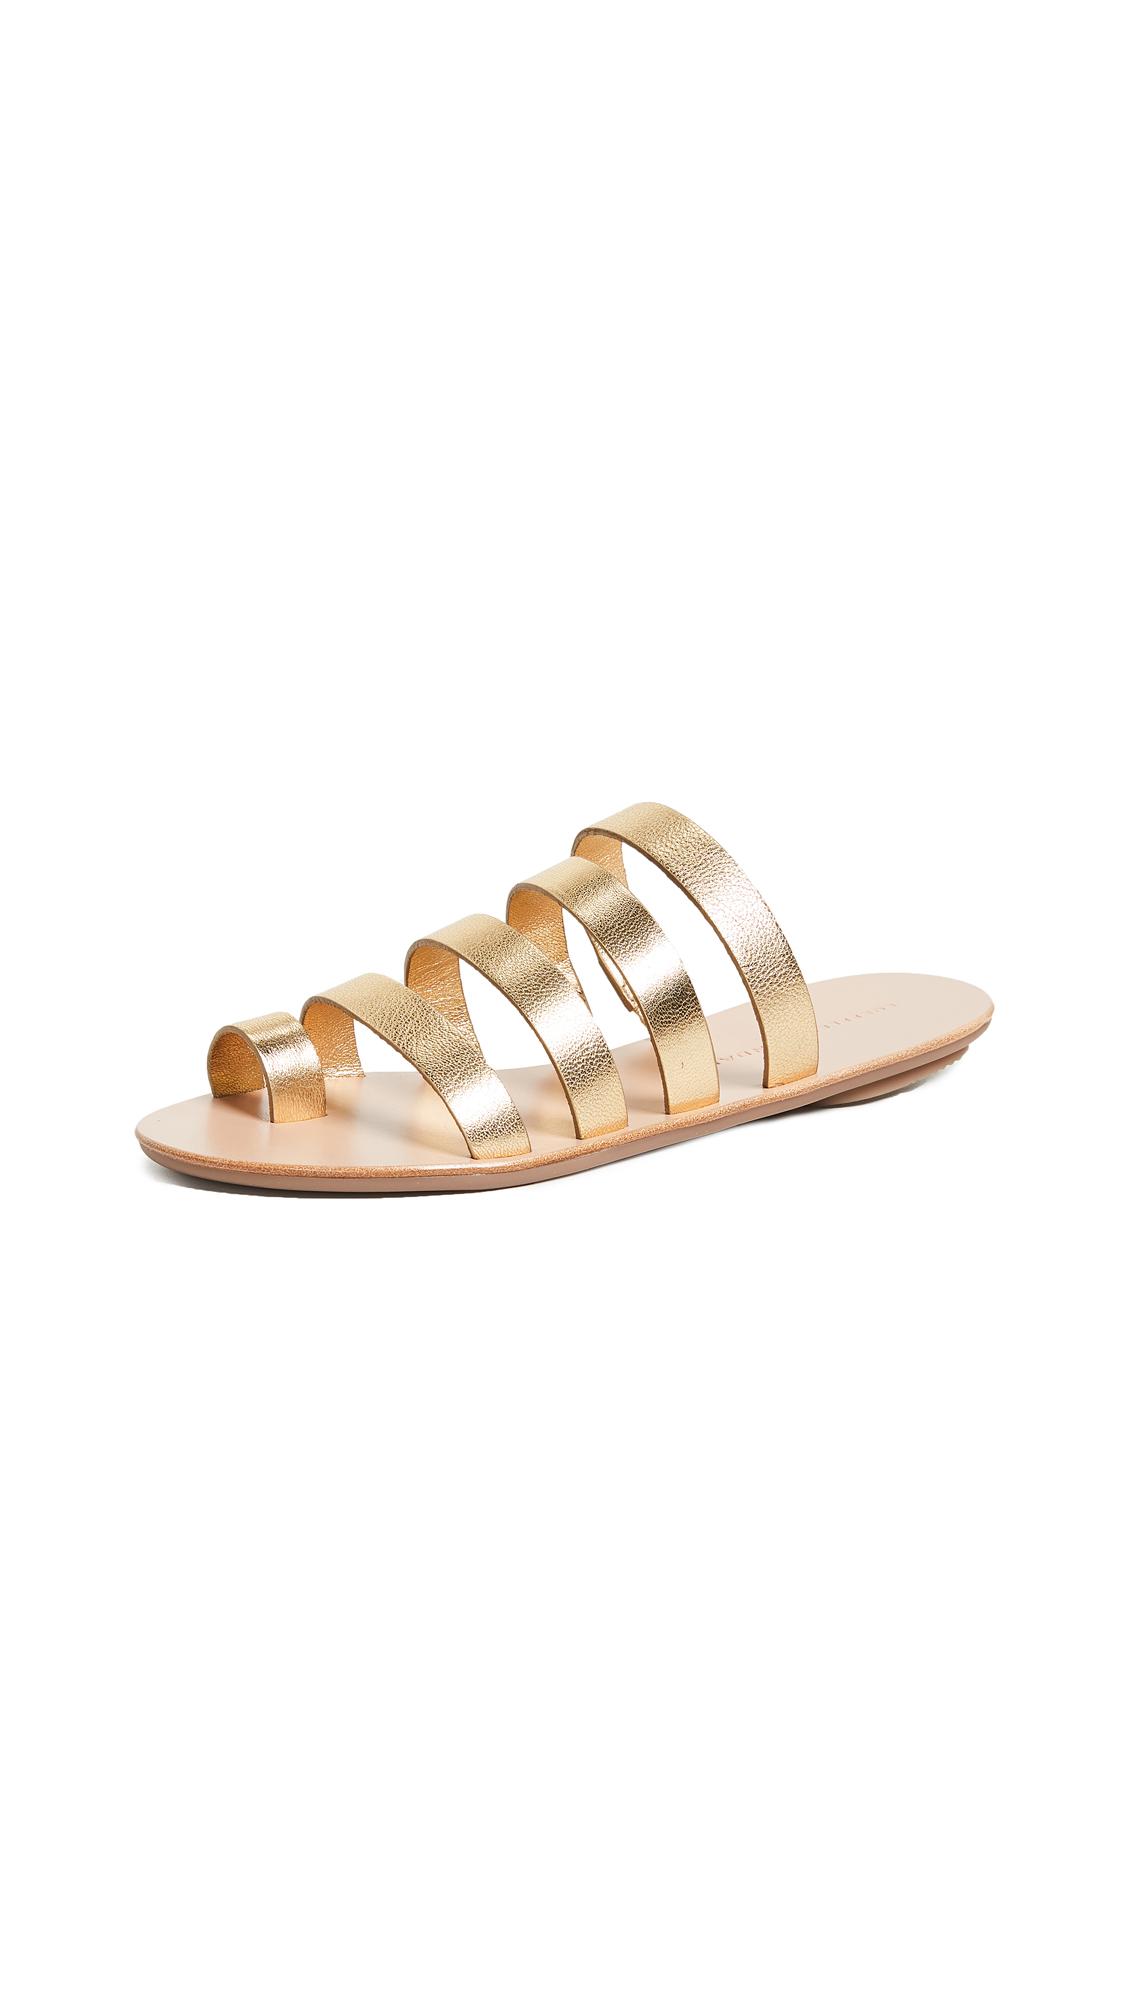 Loeffler Randall Bryce Sandals - Pale Gold